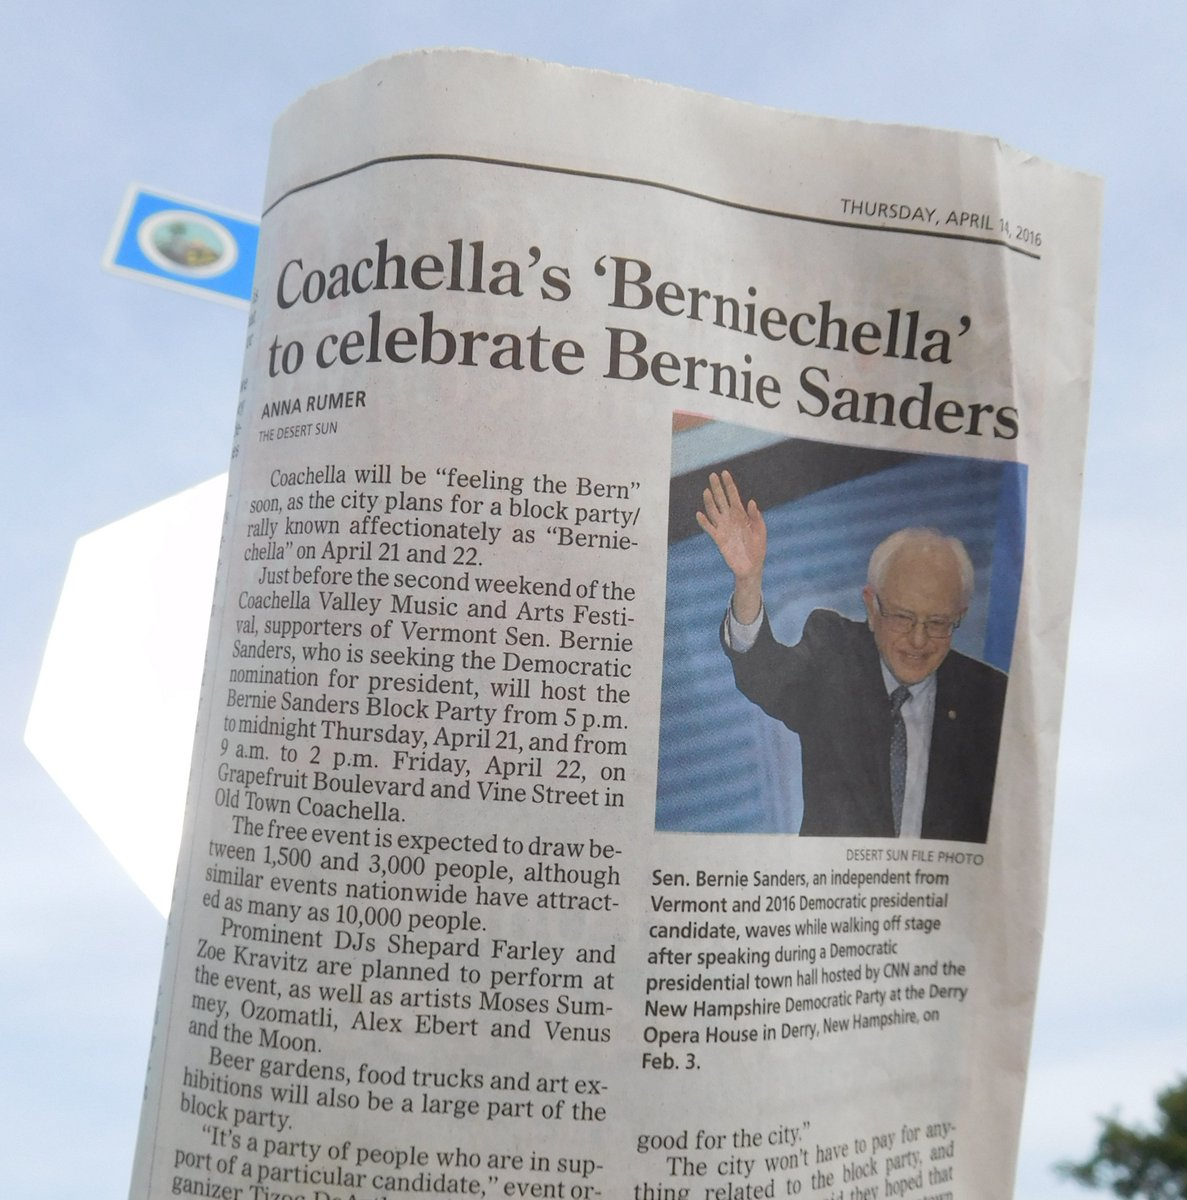 #HappeningNoW Bernie Sanders FREE Music Event here in the city of Coachella! #FeelTheBern #Bernie2016 #BernieChella https://t.co/lSepfDyZIq